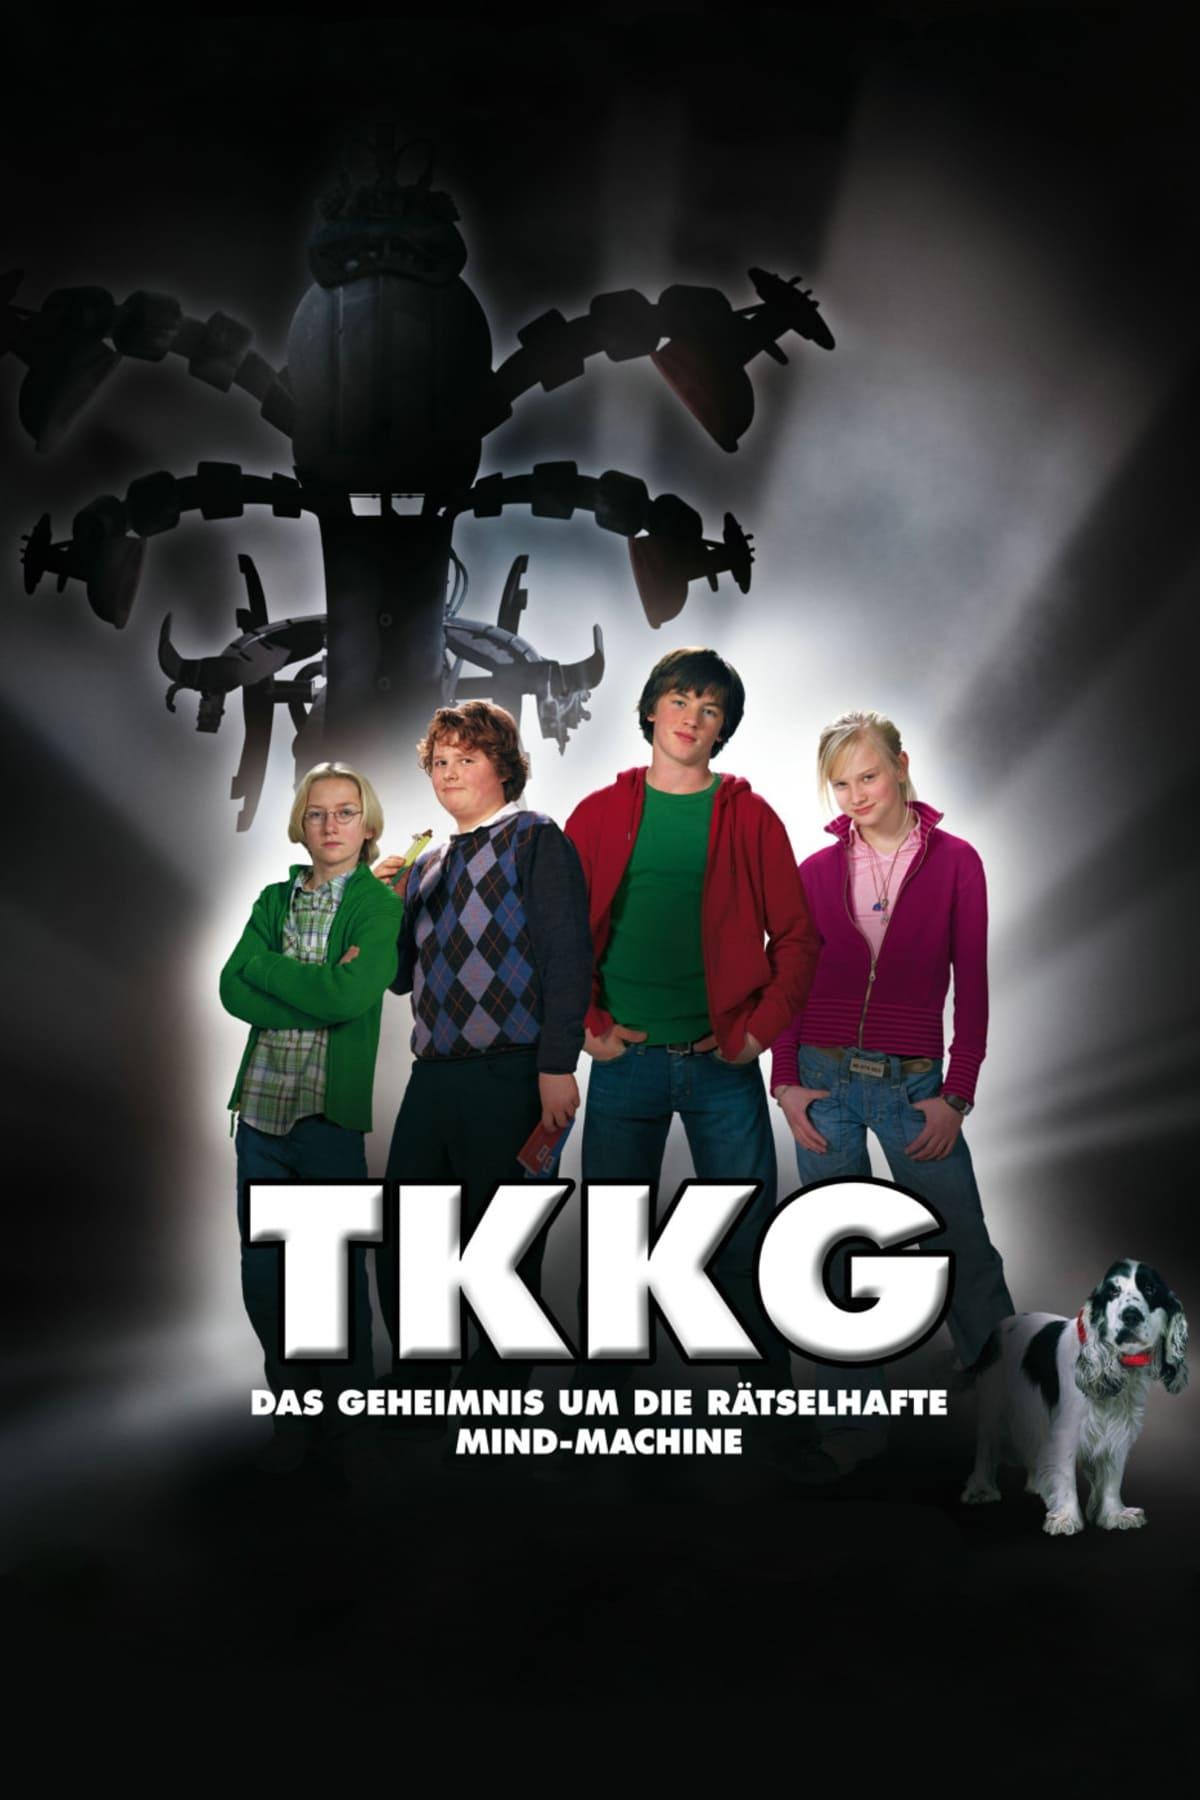 TKKG - The Secret of the Mysterious Mind Machine